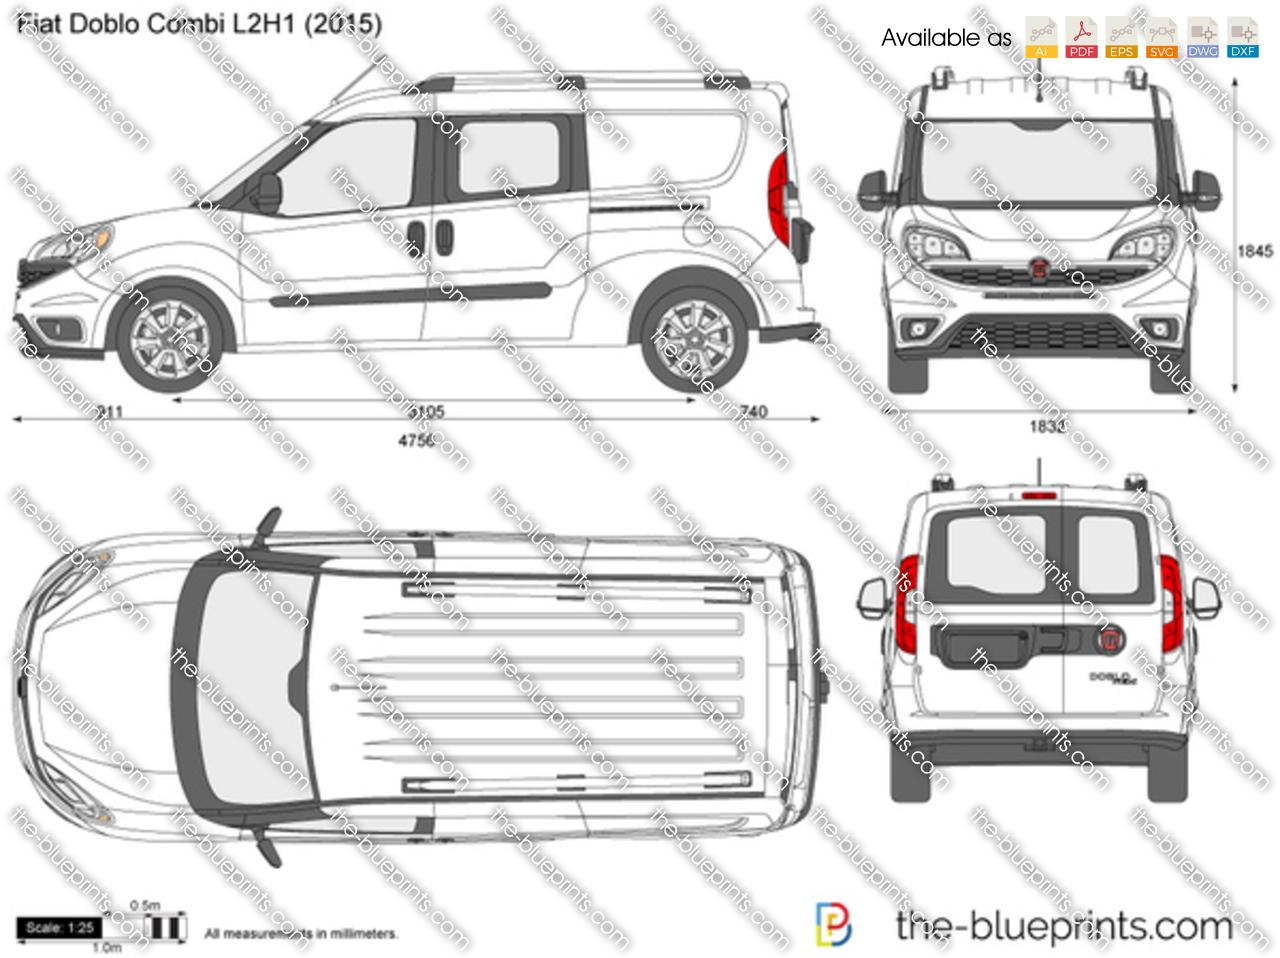 Fiat Doblo Combi L2H1 vector drawing